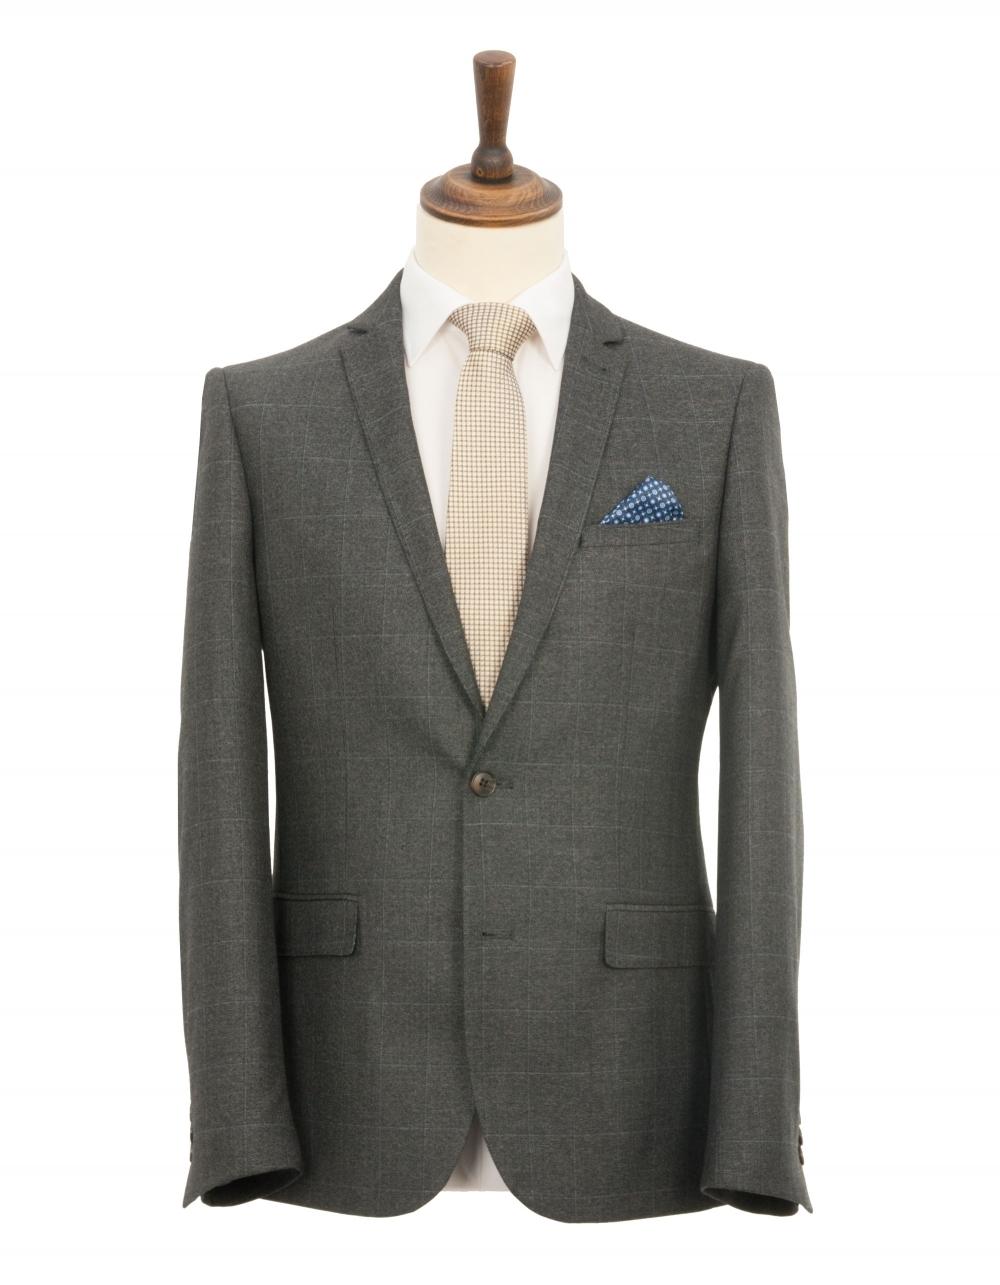 Harry brown black label jacket